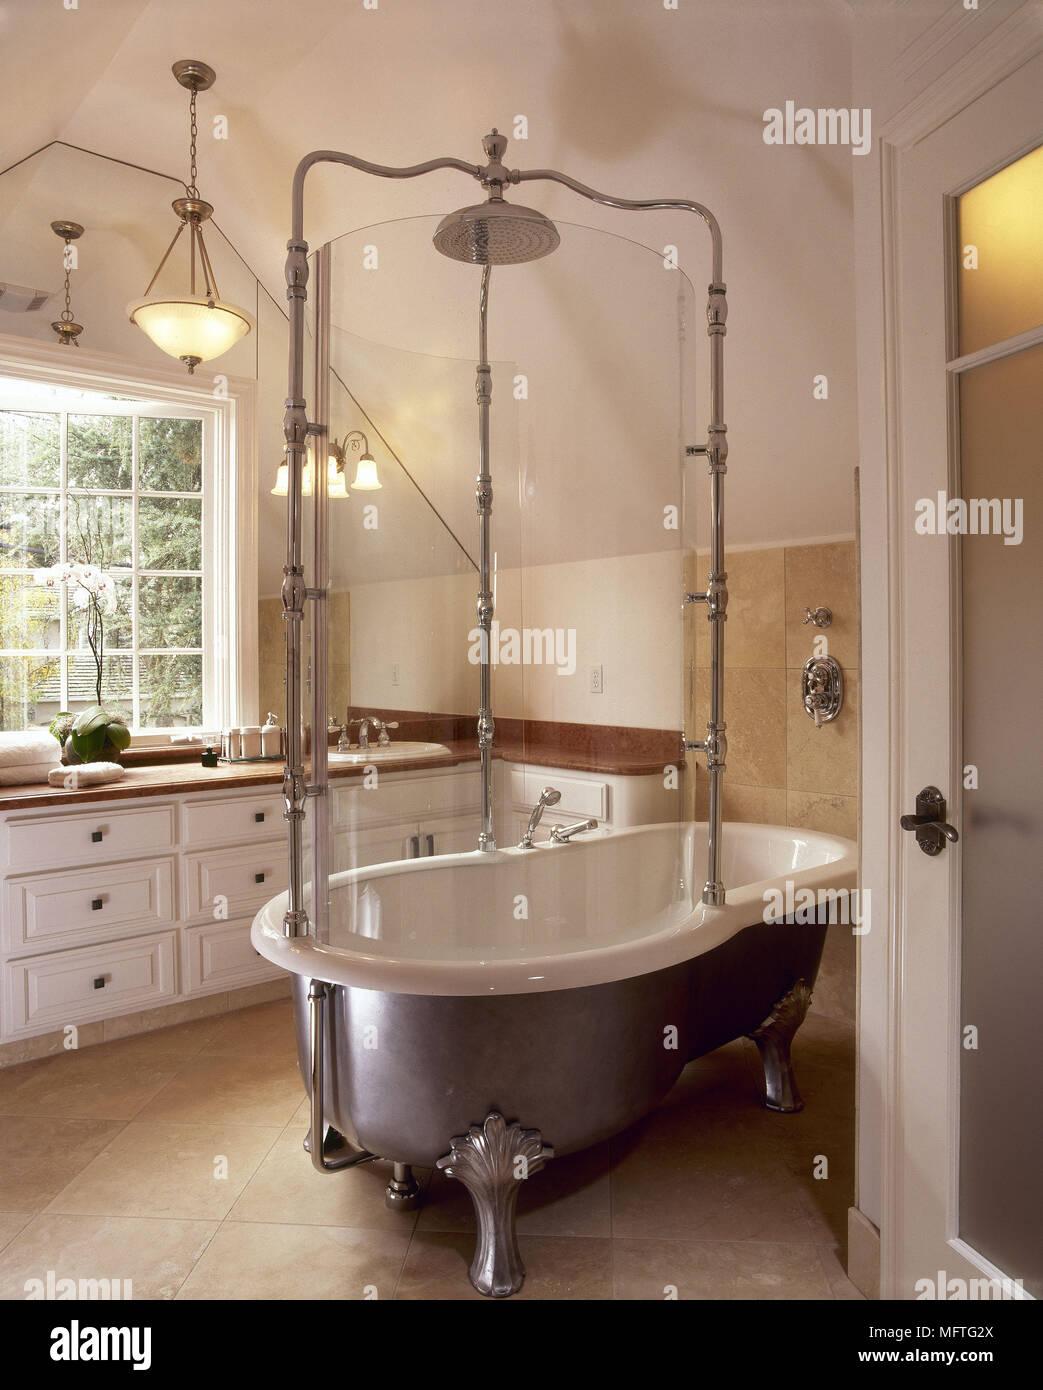 edwardian bathroom stockfotos edwardian bathroom bilder. Black Bedroom Furniture Sets. Home Design Ideas